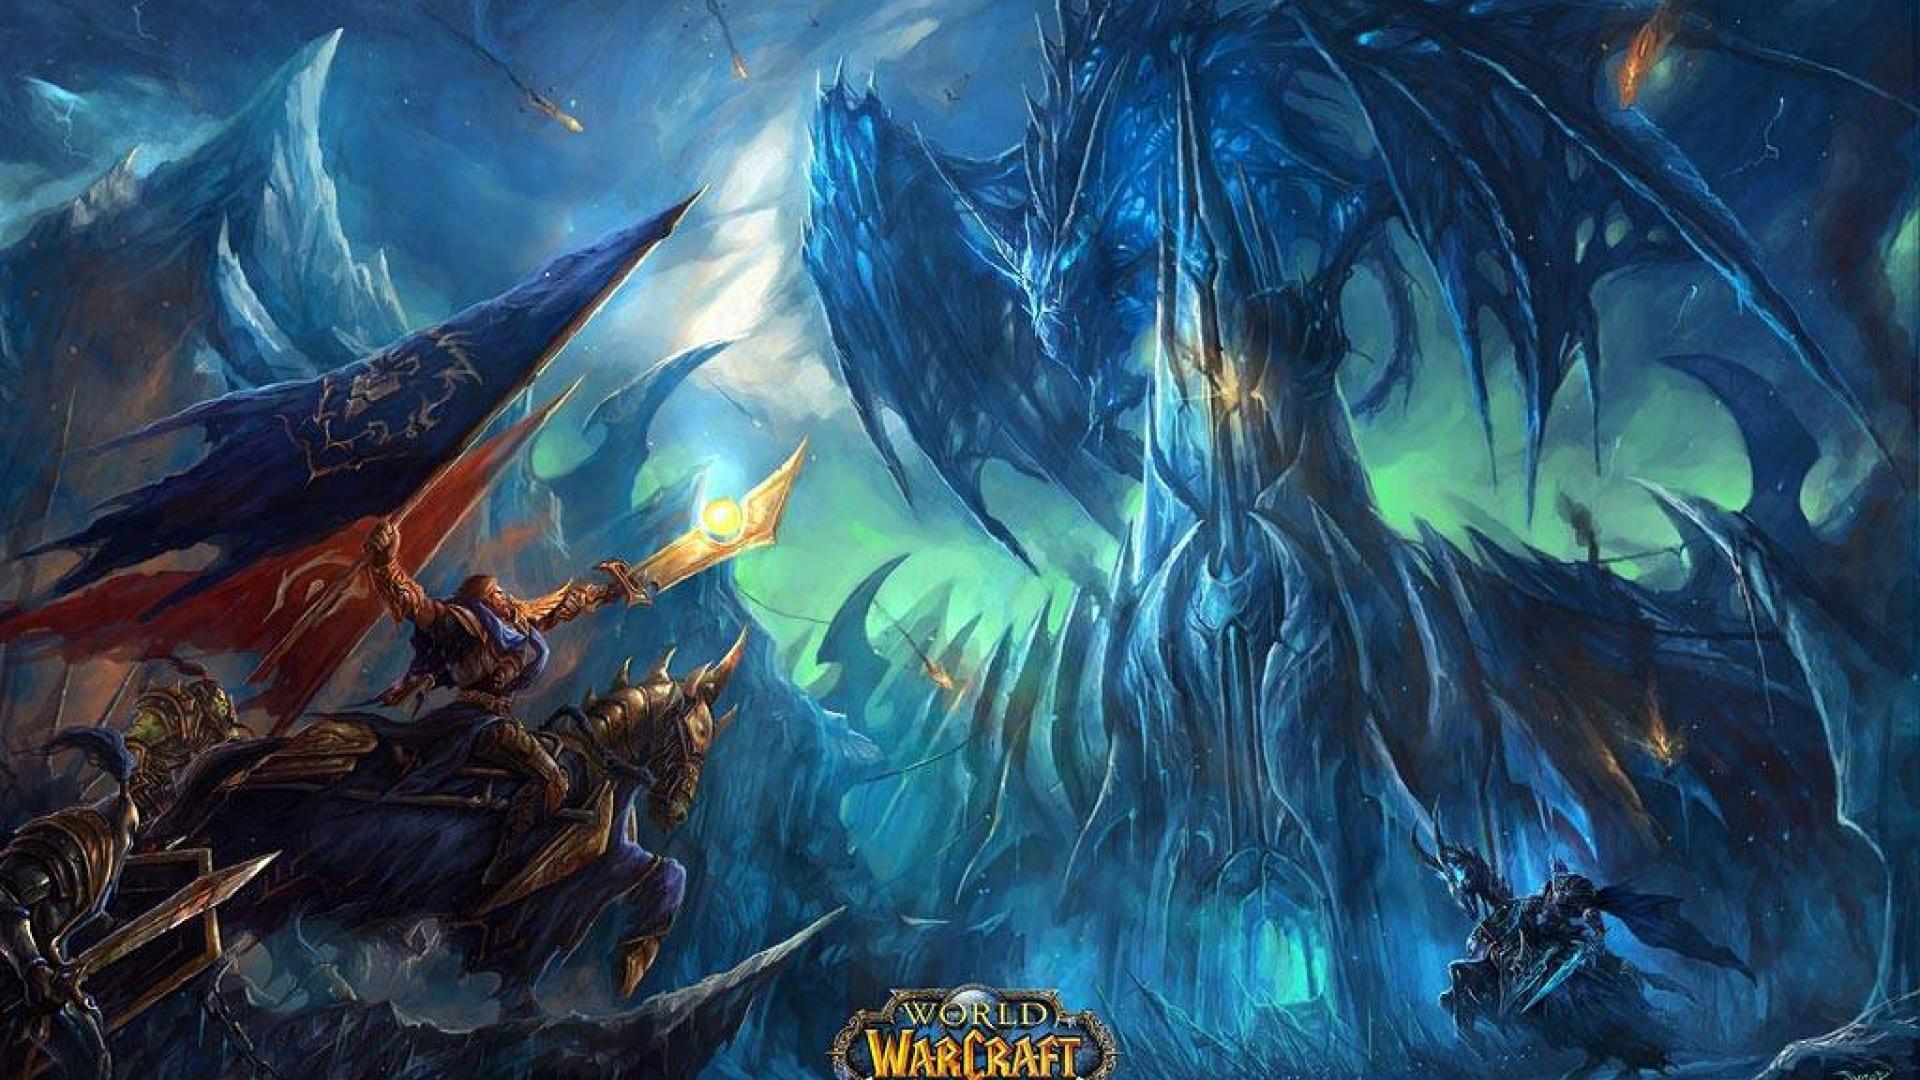 Free Download Best Game World Of Warcraft Wallpaper Hd 2